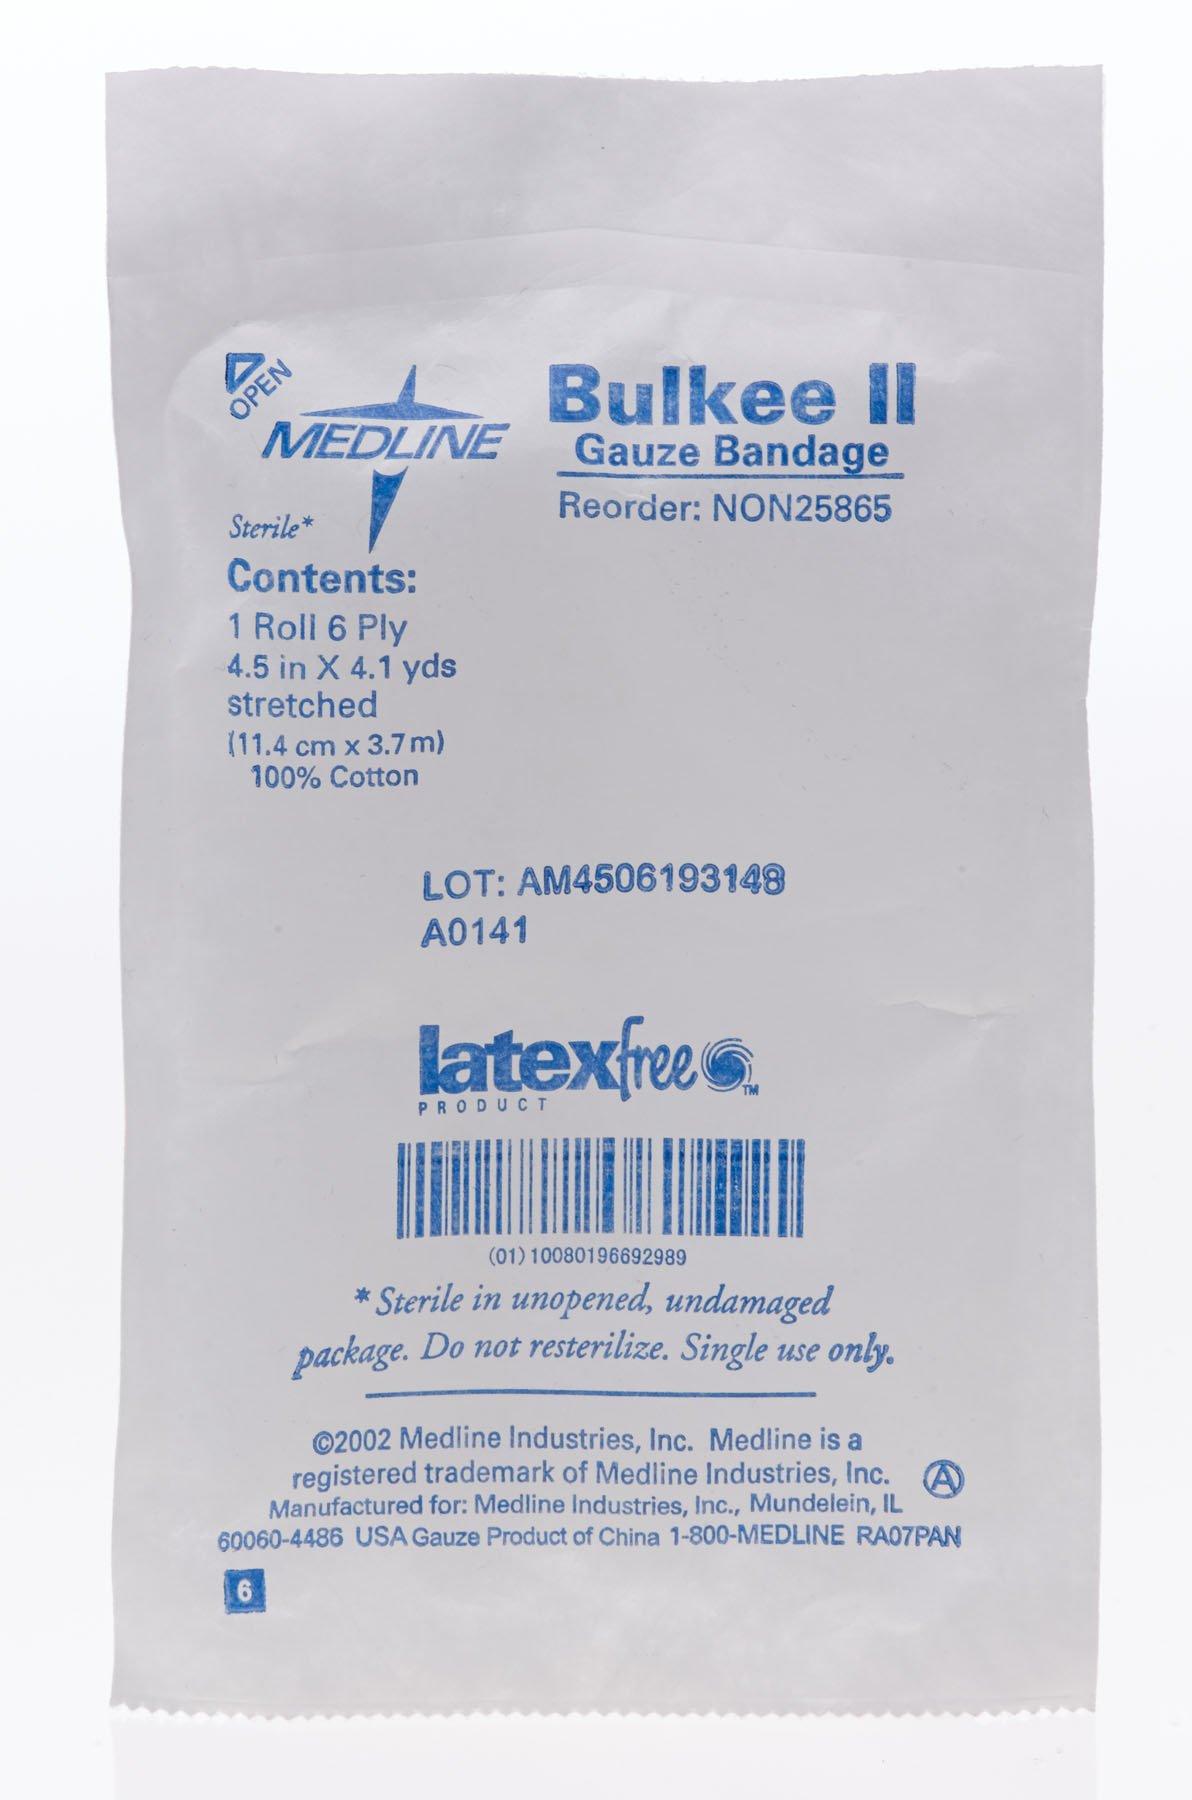 Medline Bandage Gauze Bulkee Ii, 4.5 Inch x 4.1 Yard, 100 Count by Medline